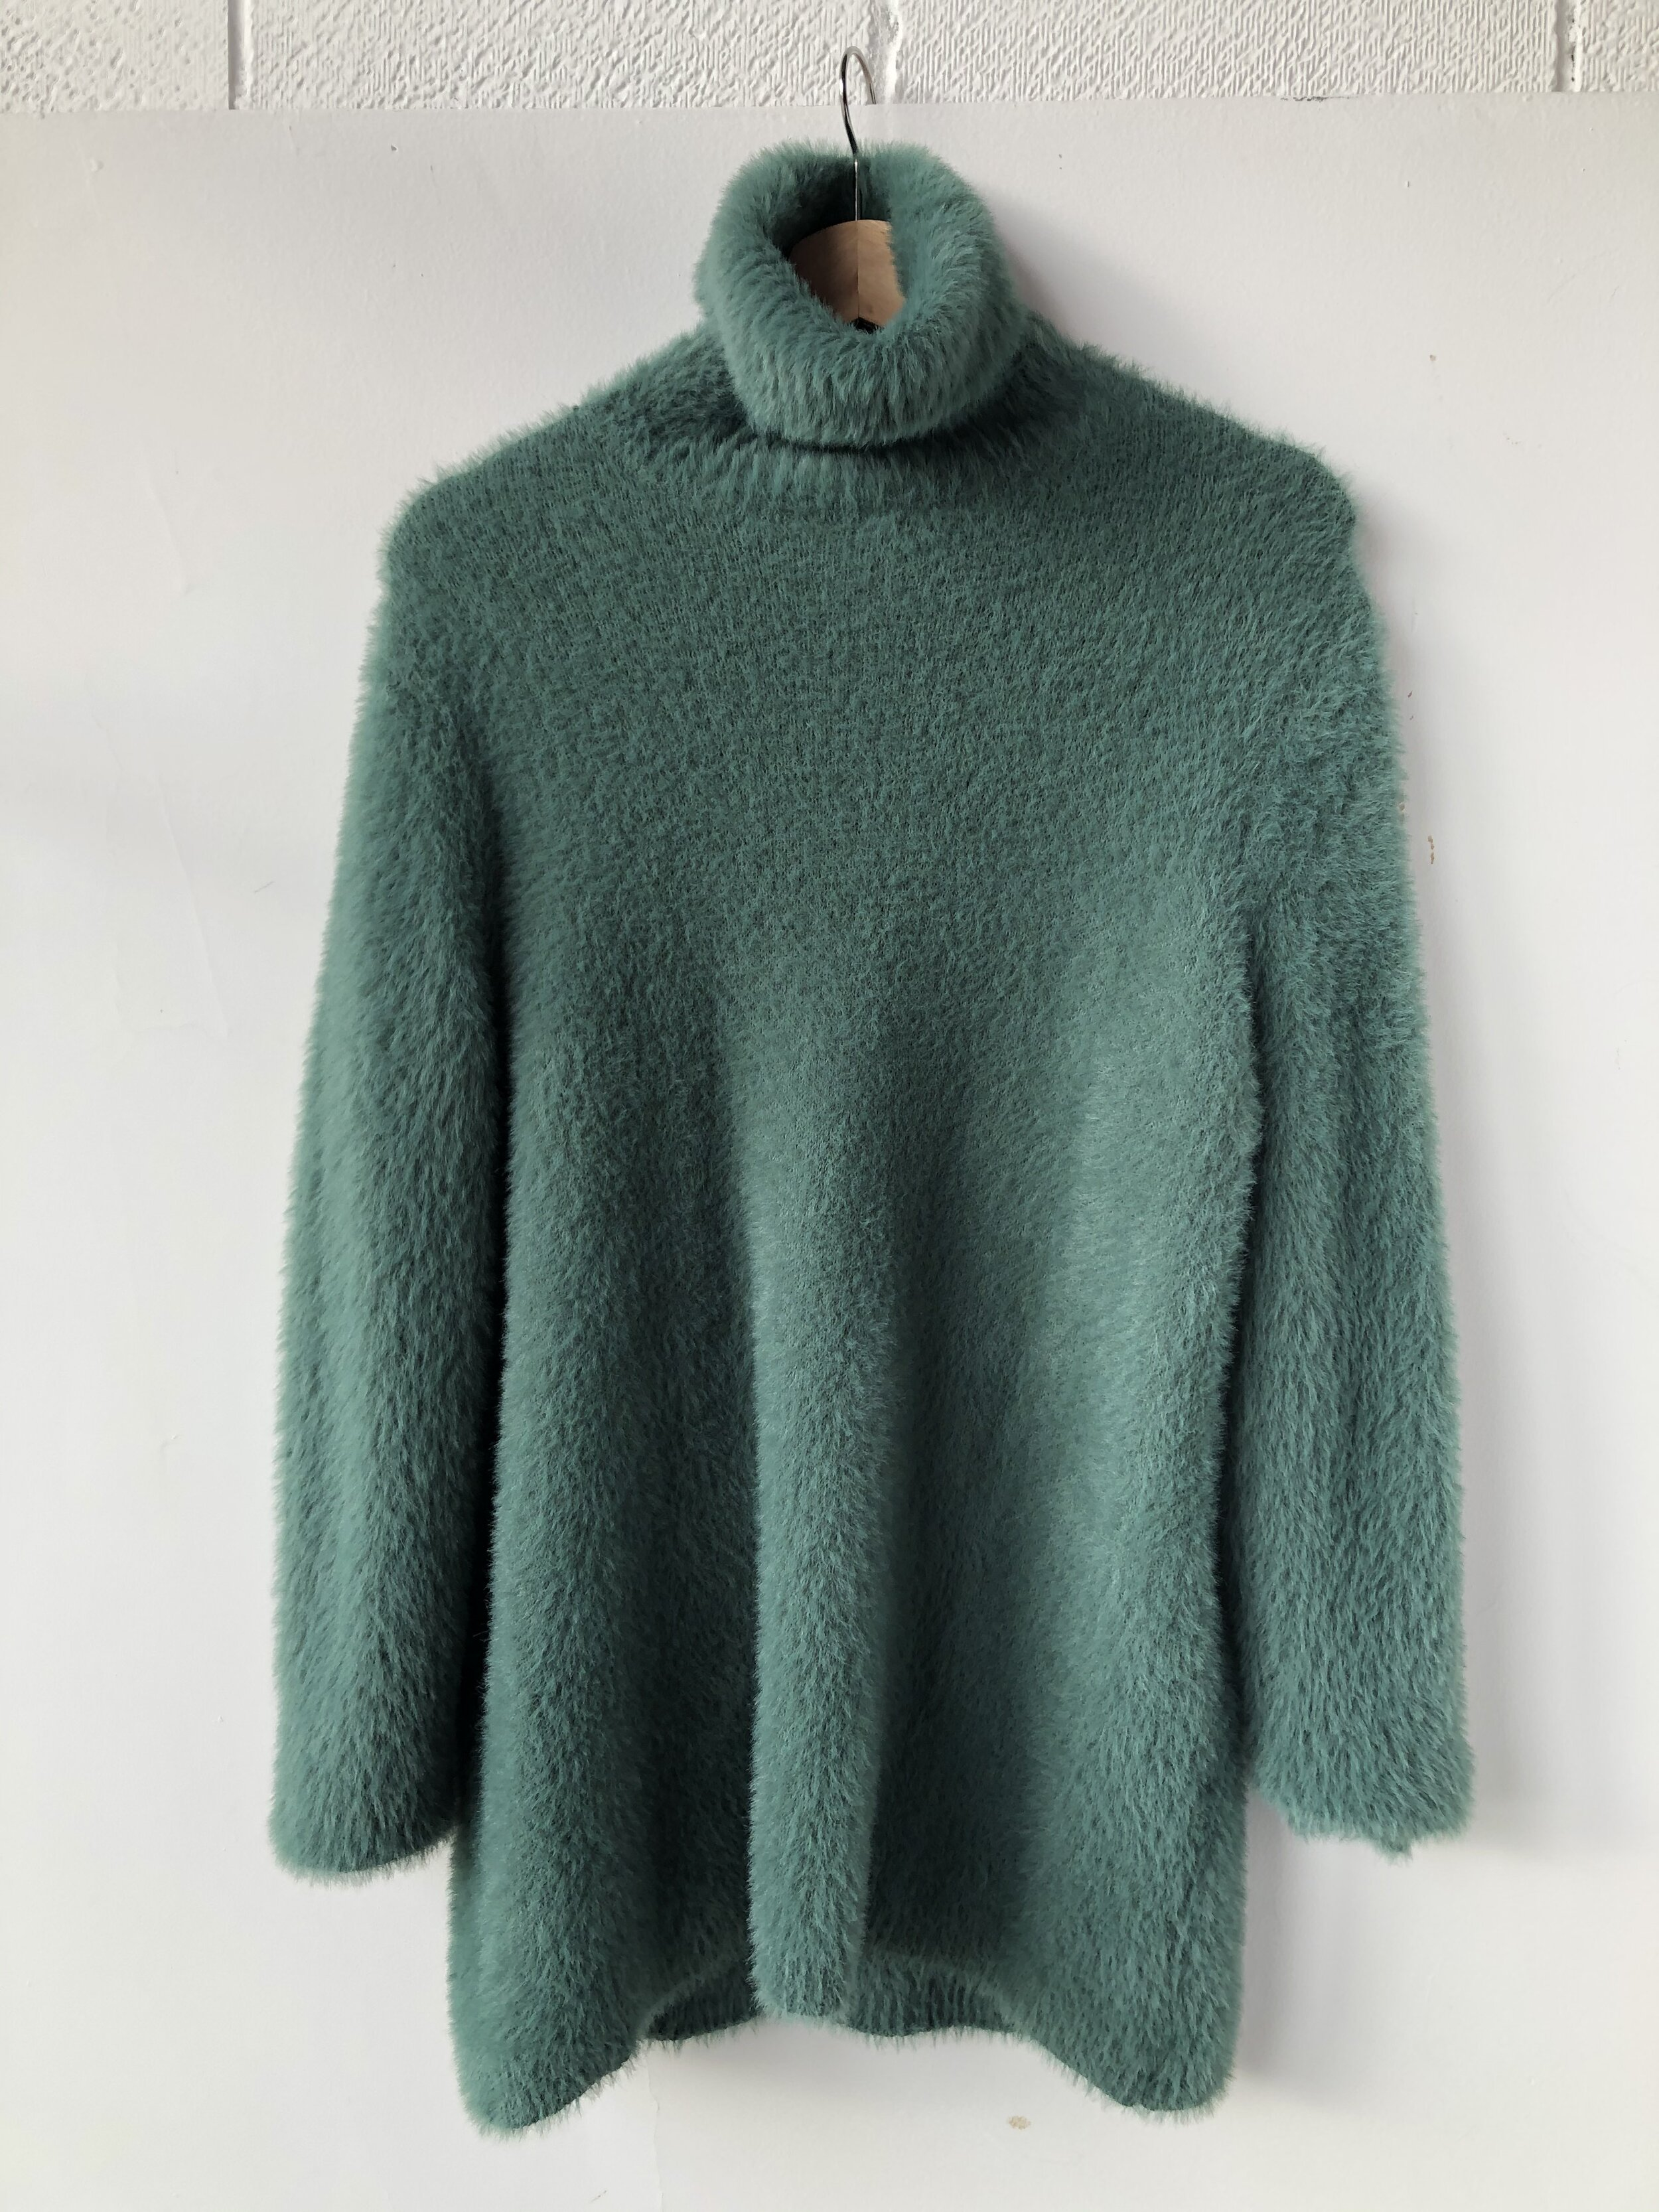 Sweater; Size L, $36